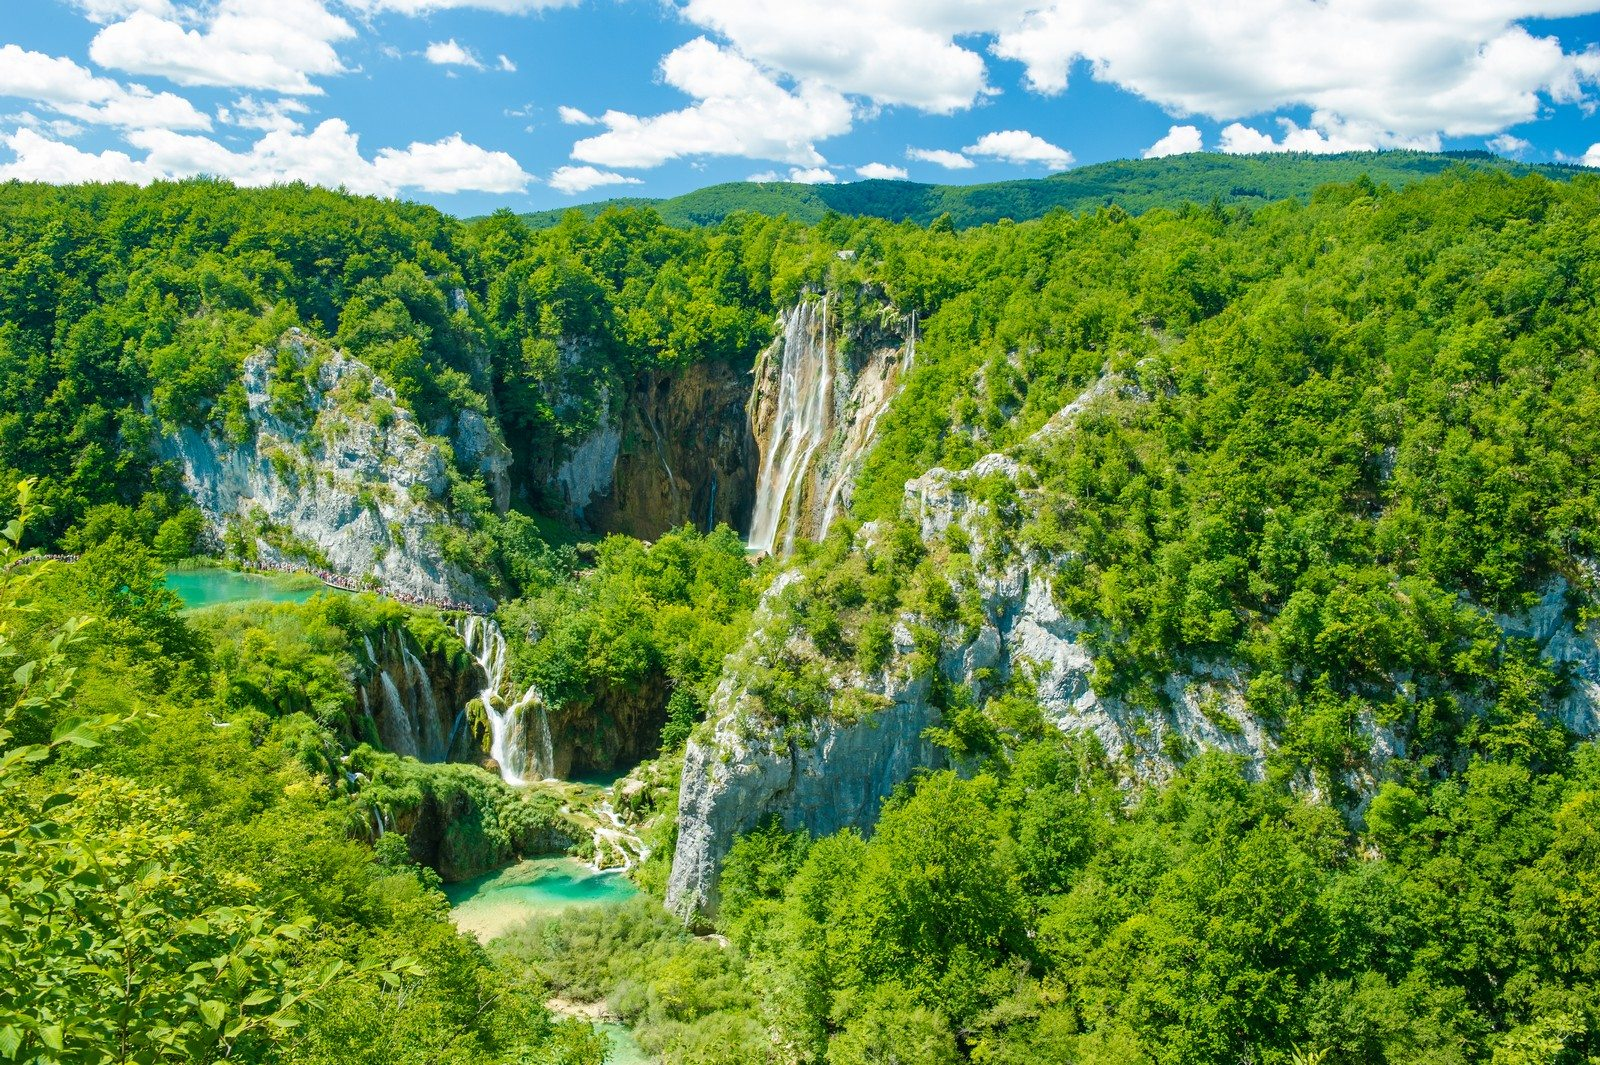 Private Tours To Plitvice Lakes